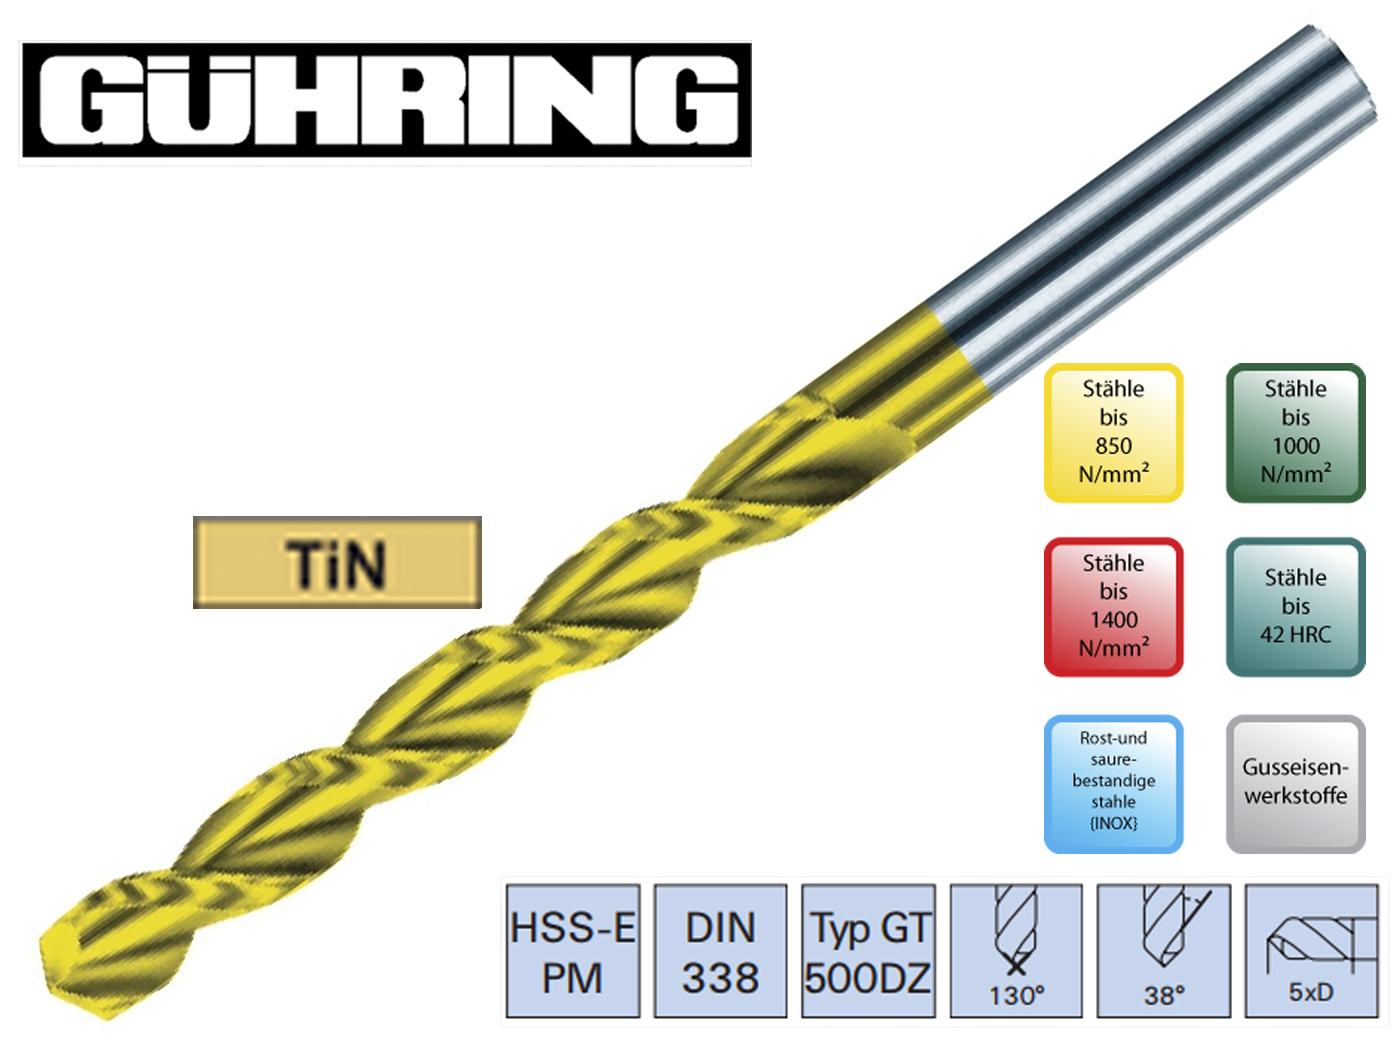 Spiraalboor DIN 338 GT HSS E PM Guhring | DKMTools - DKM Tools